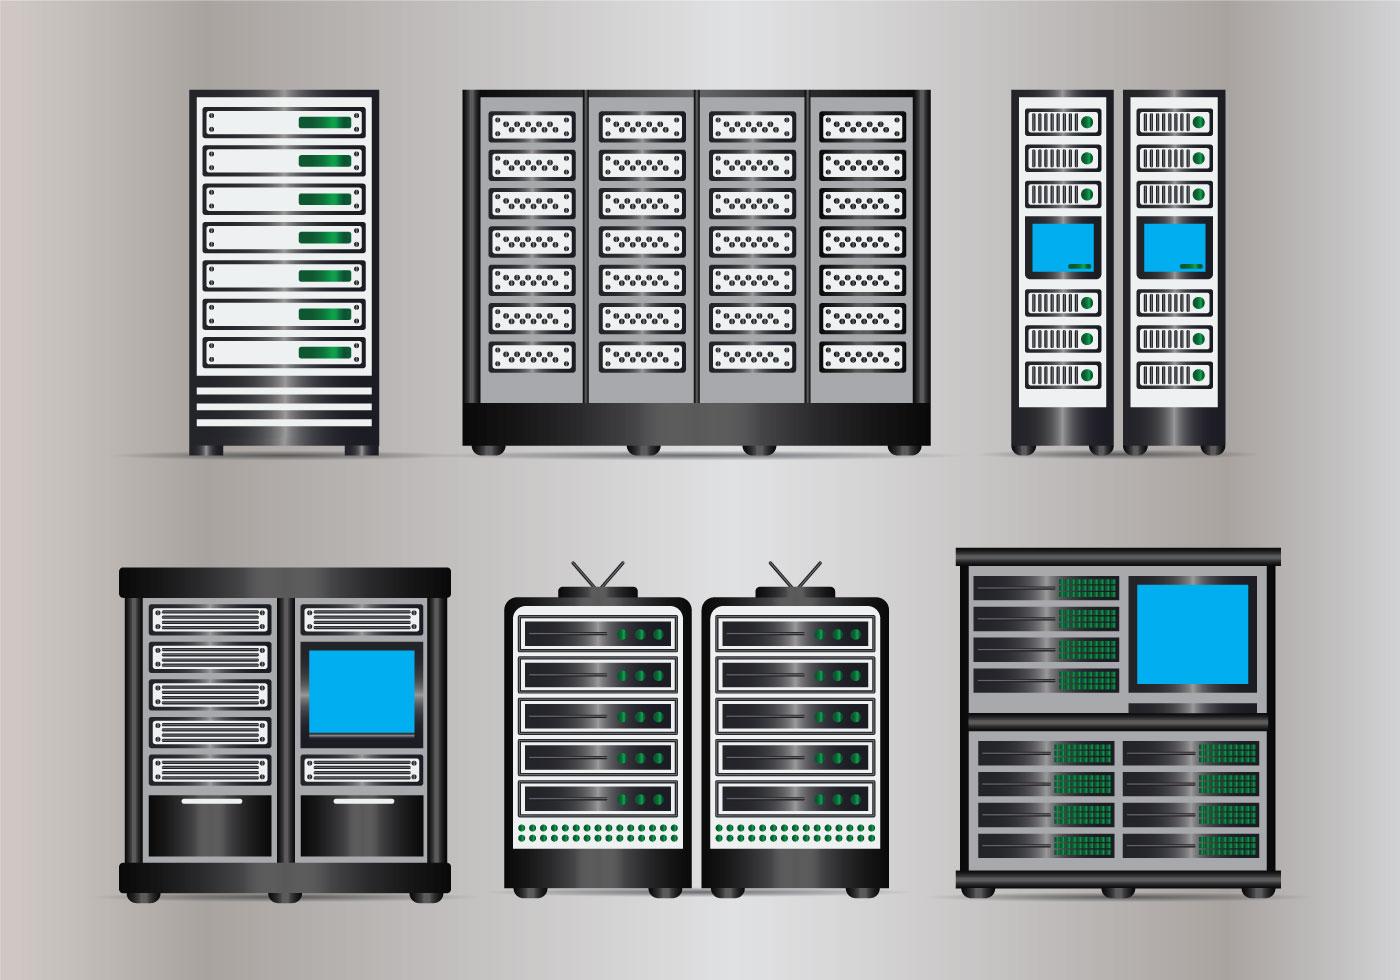 server rack vector - download free vector art, stock graphics & images